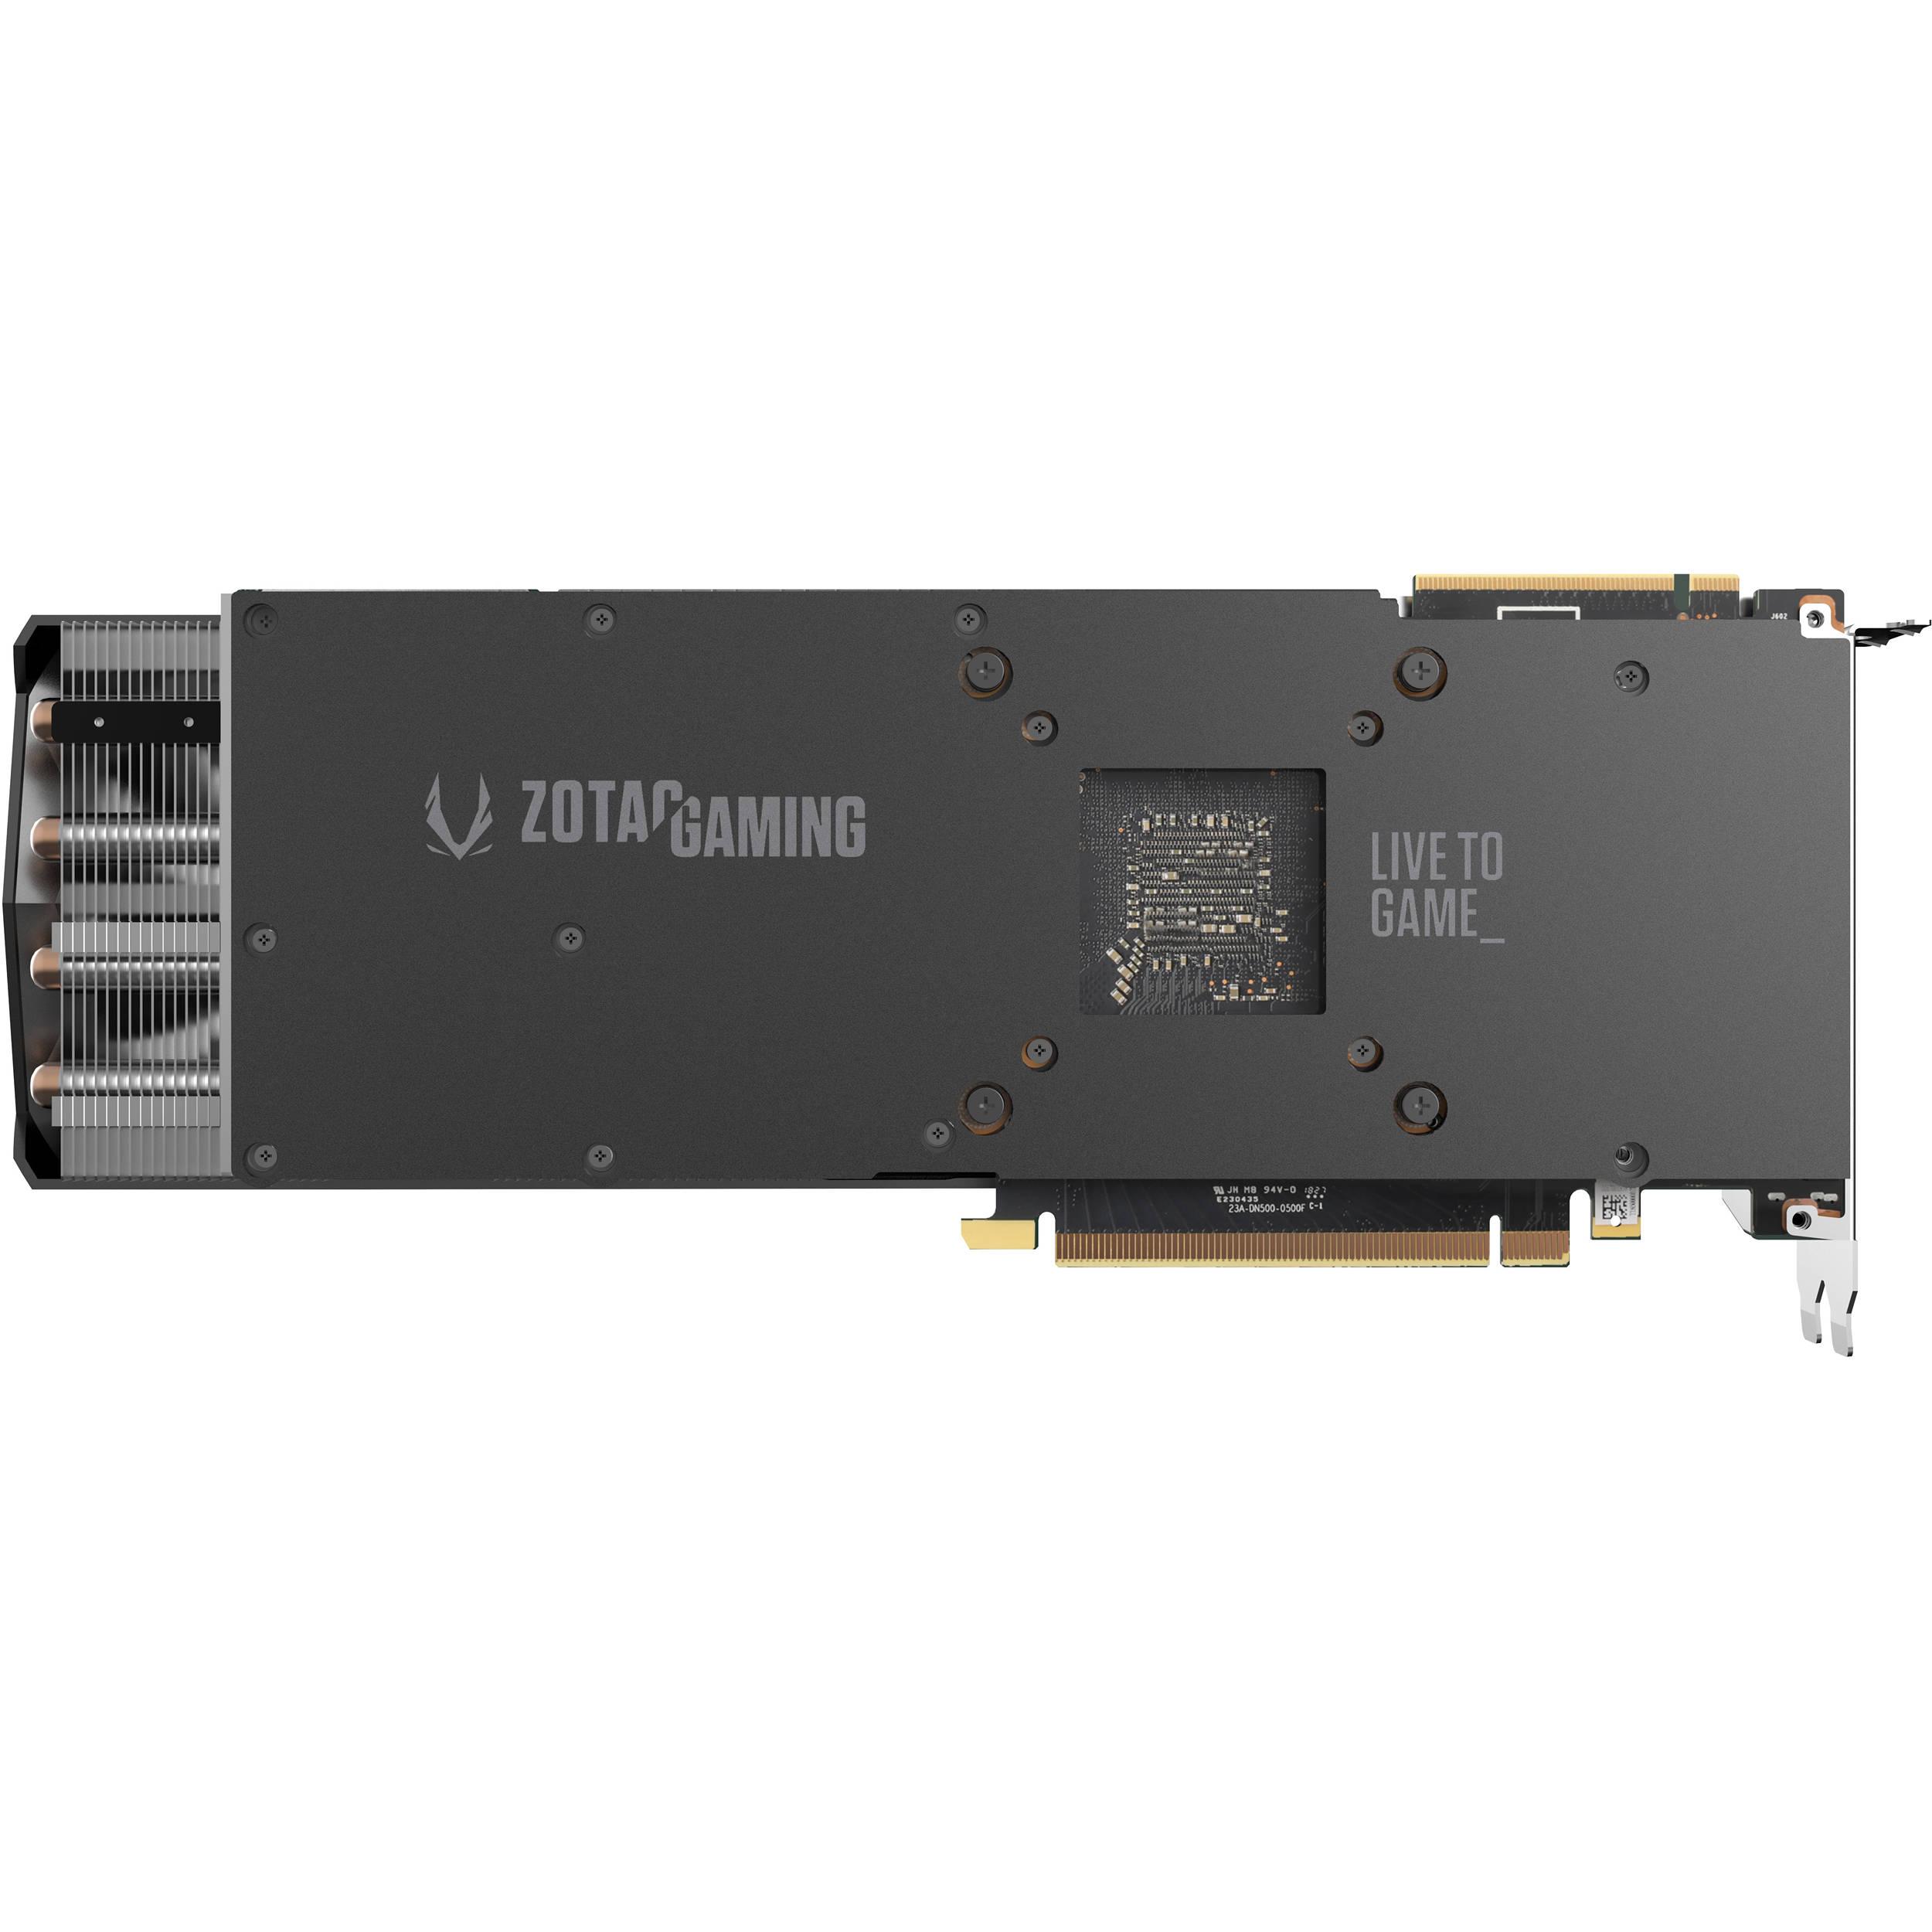 ZOTAC GAMING GeForce RTX 2080 AMP Graphics Card